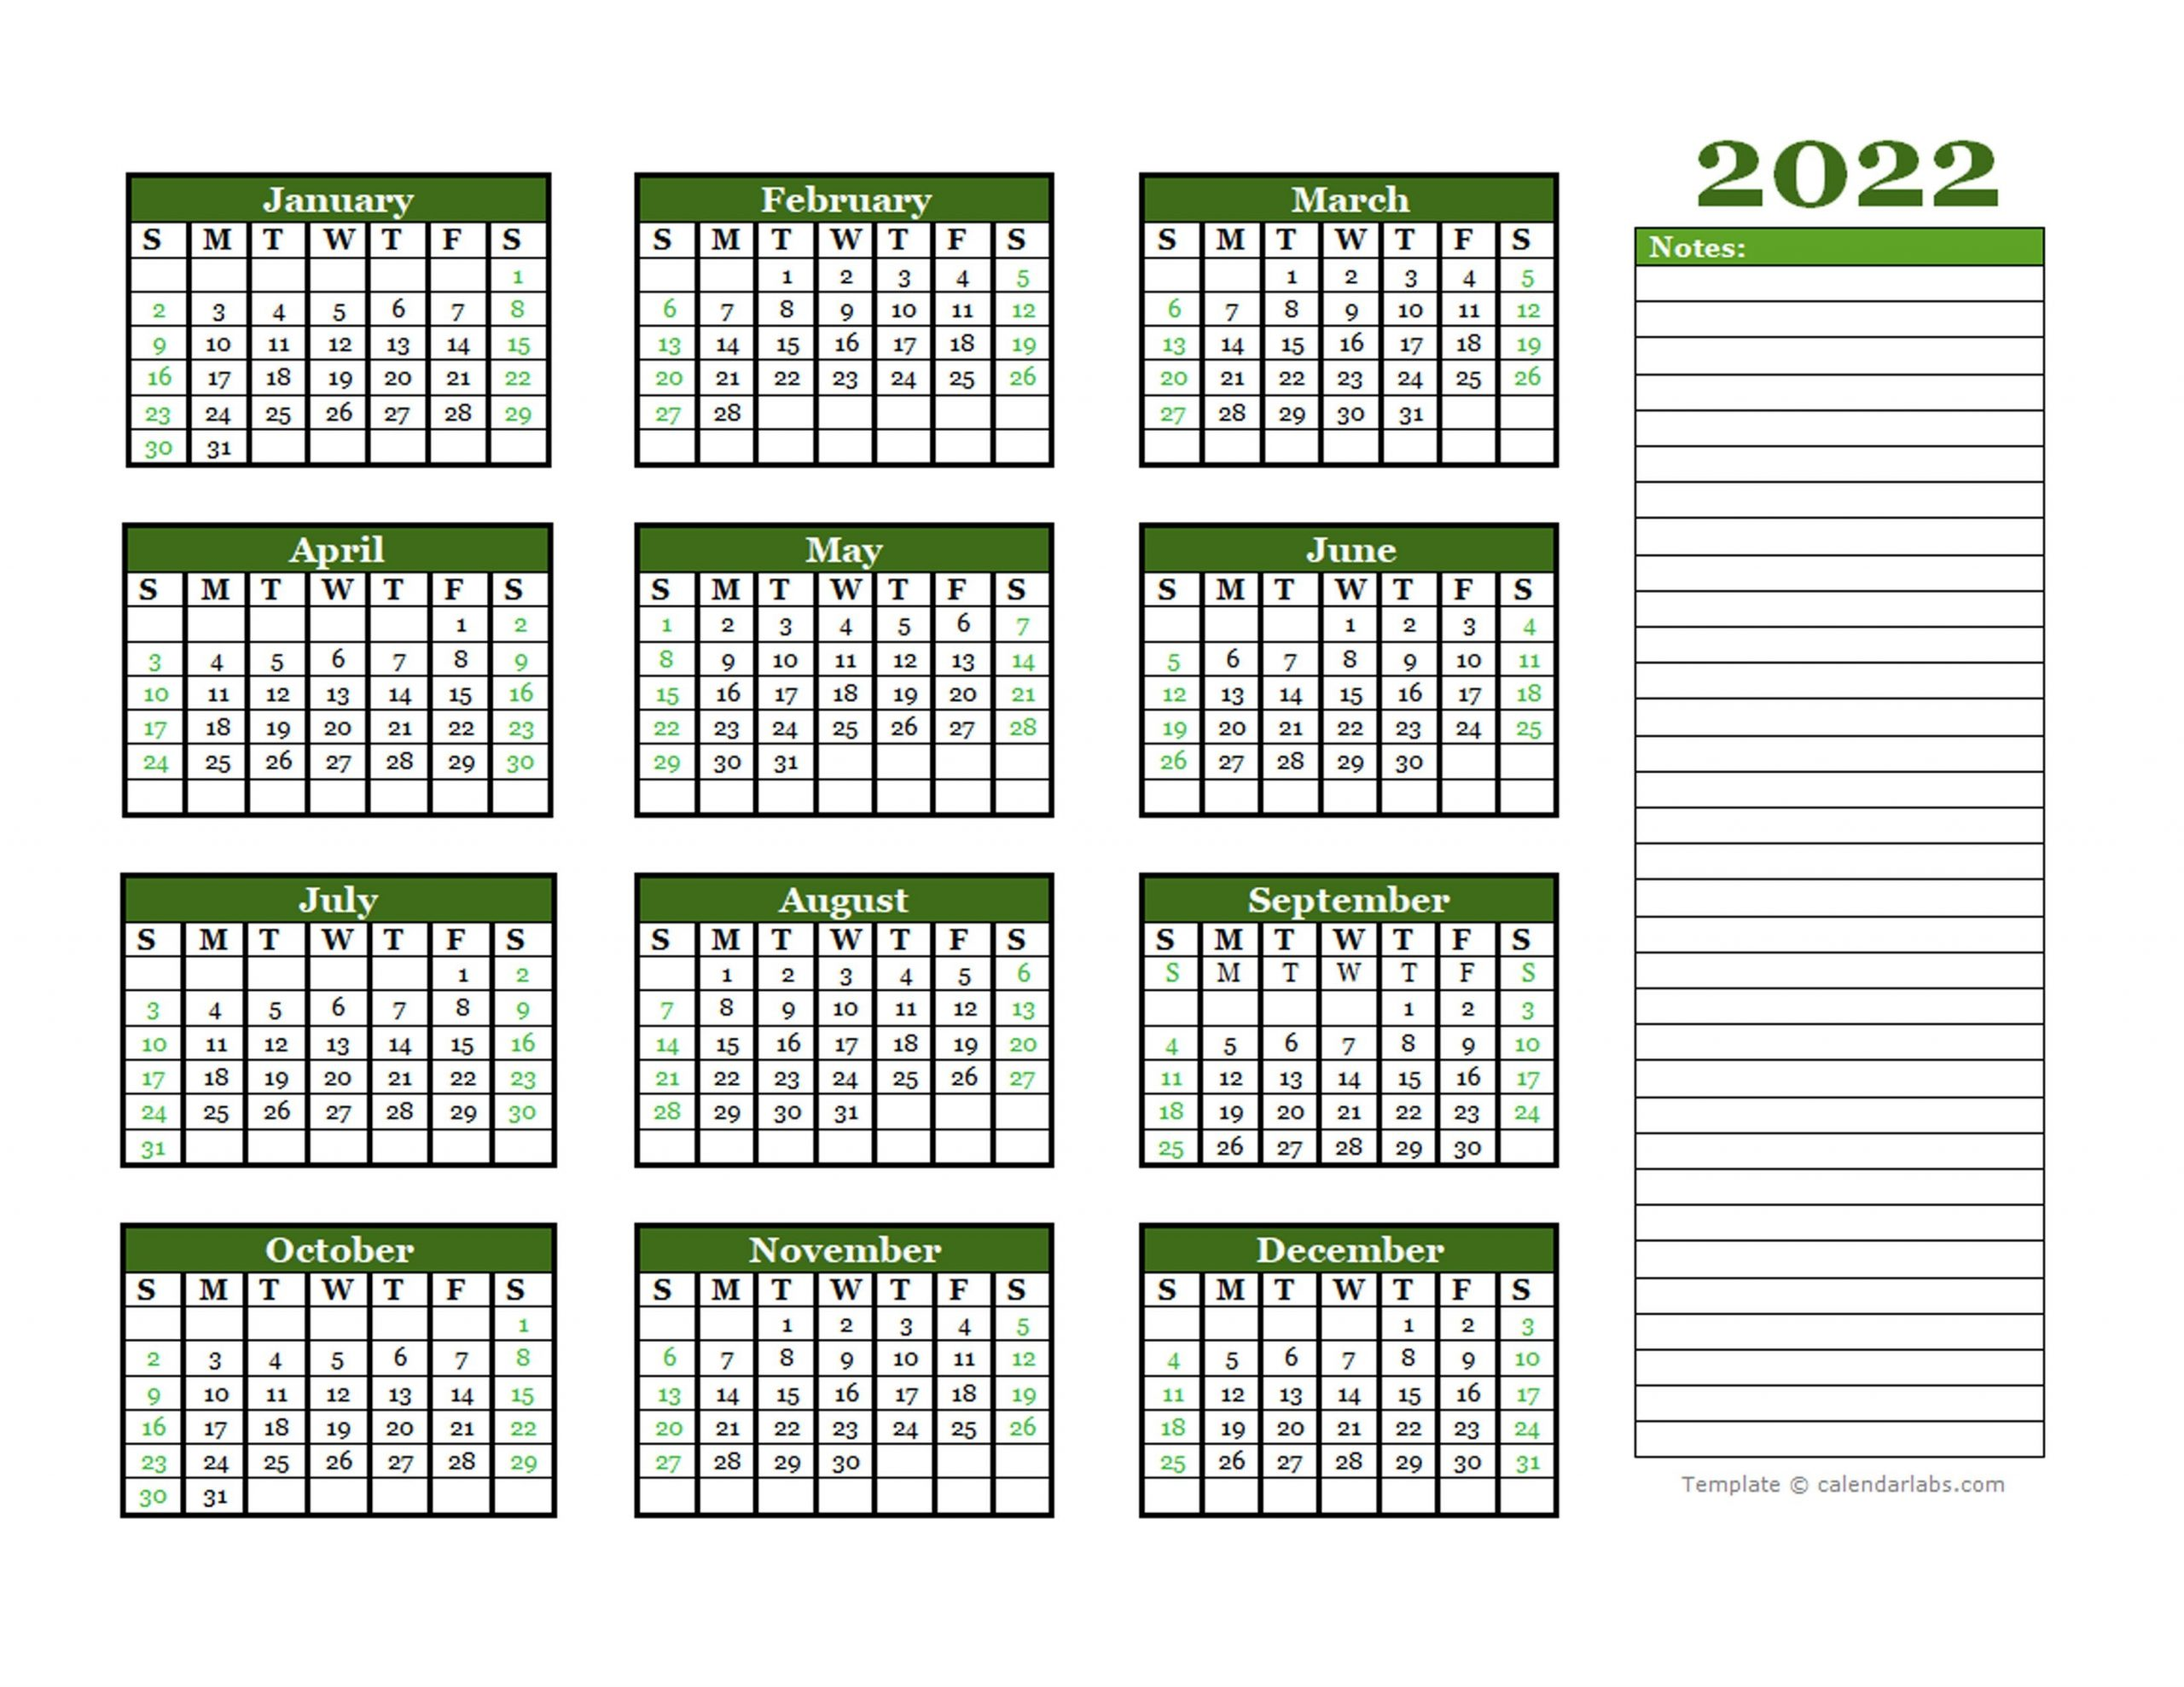 Julian Calendar 2022 Printable | Printable Calendar 2021 within Julian Calendar 2021 Printable Free Photo